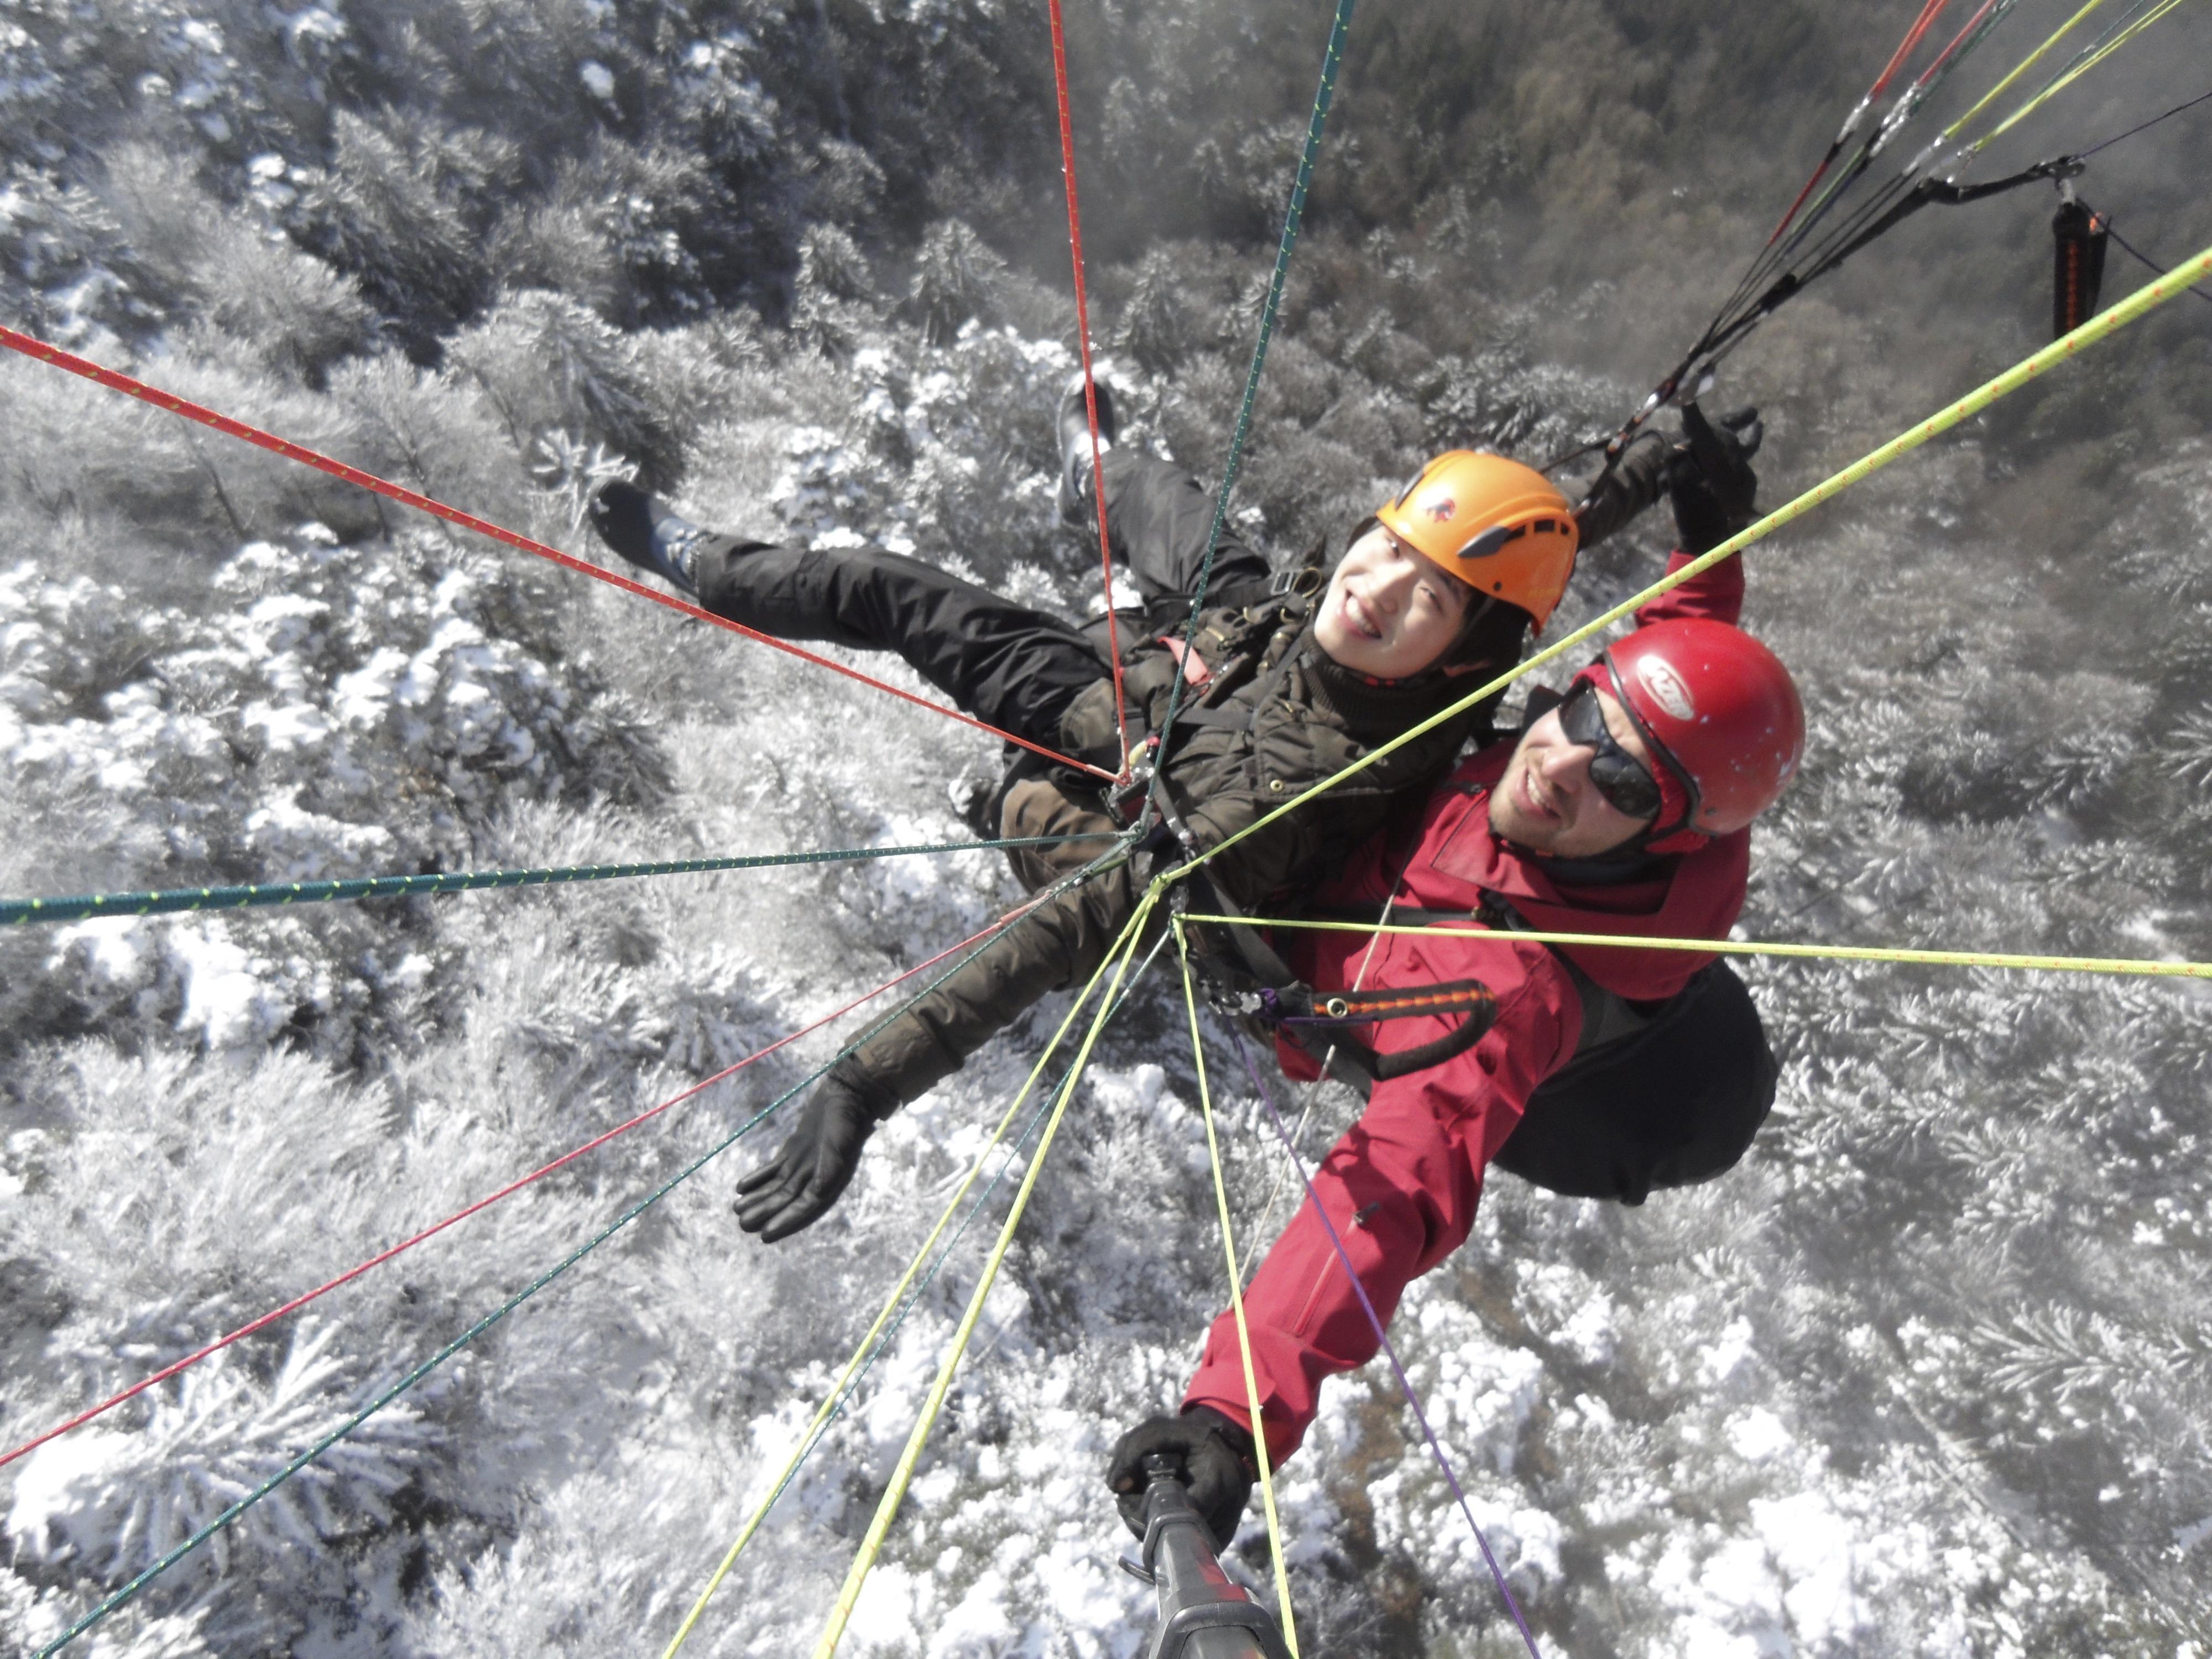 swiss-paragliding-wald-schnee-winter